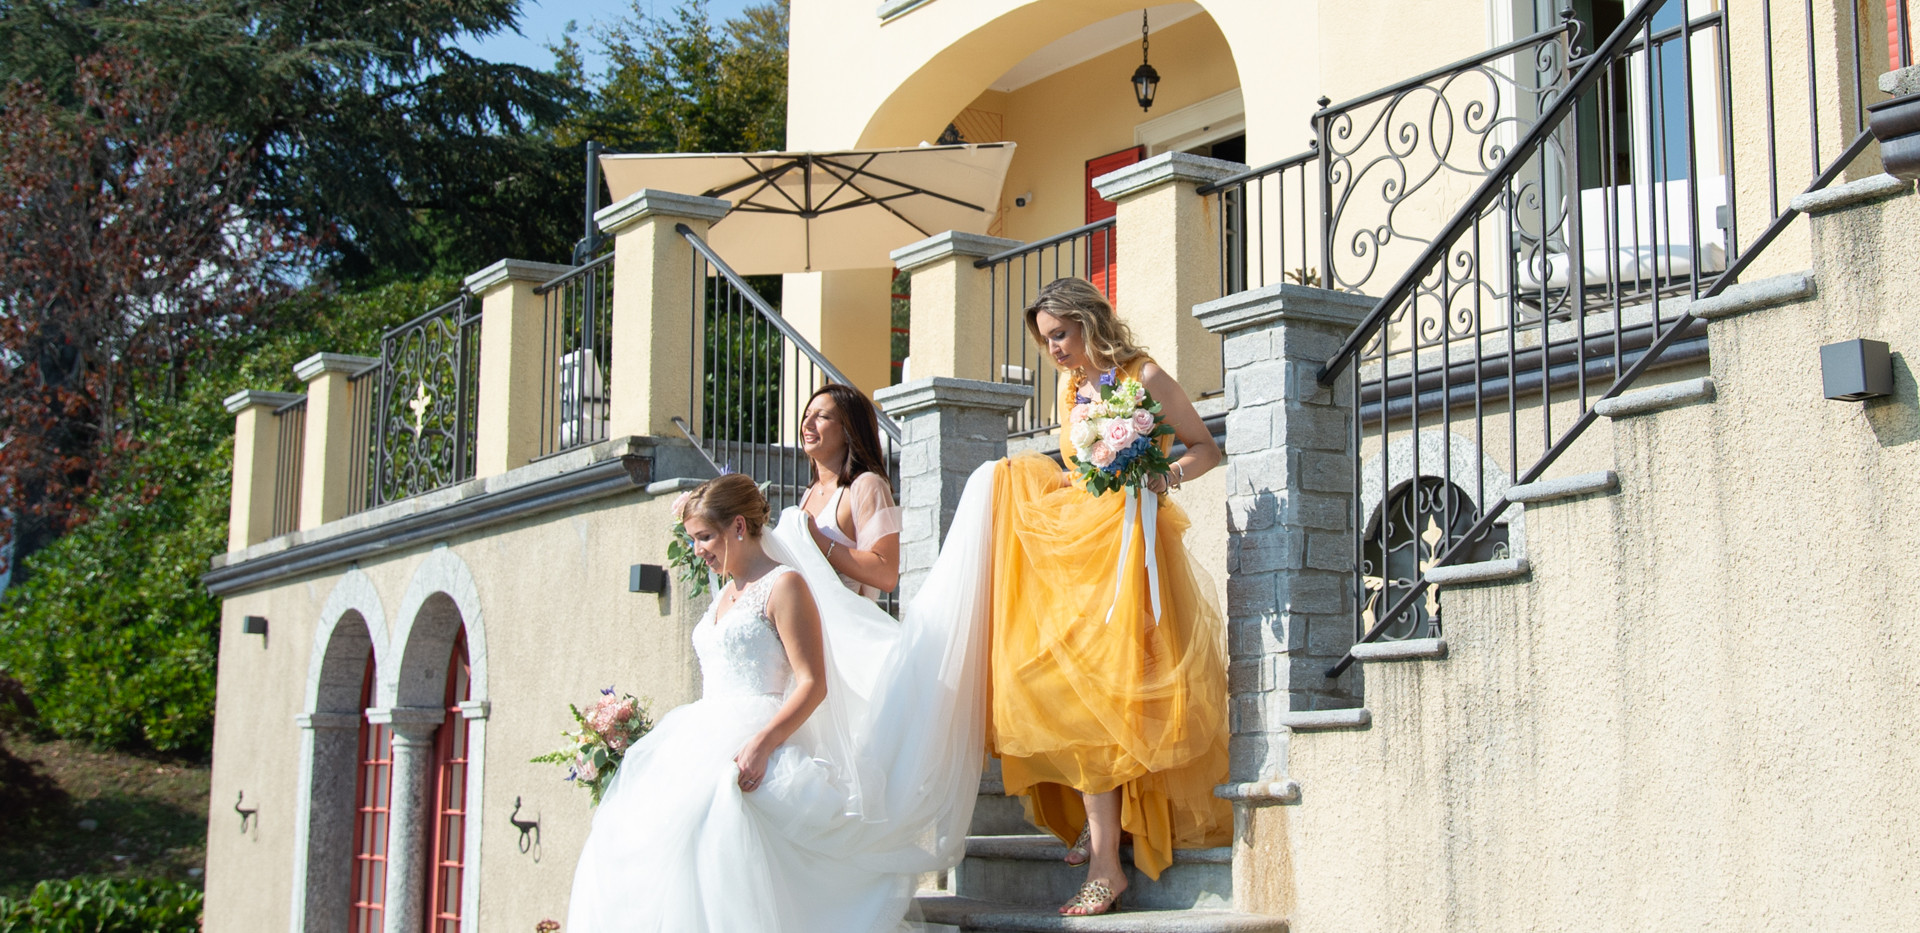 Villa Confalonieri: arrivo sposa alla cerimonia